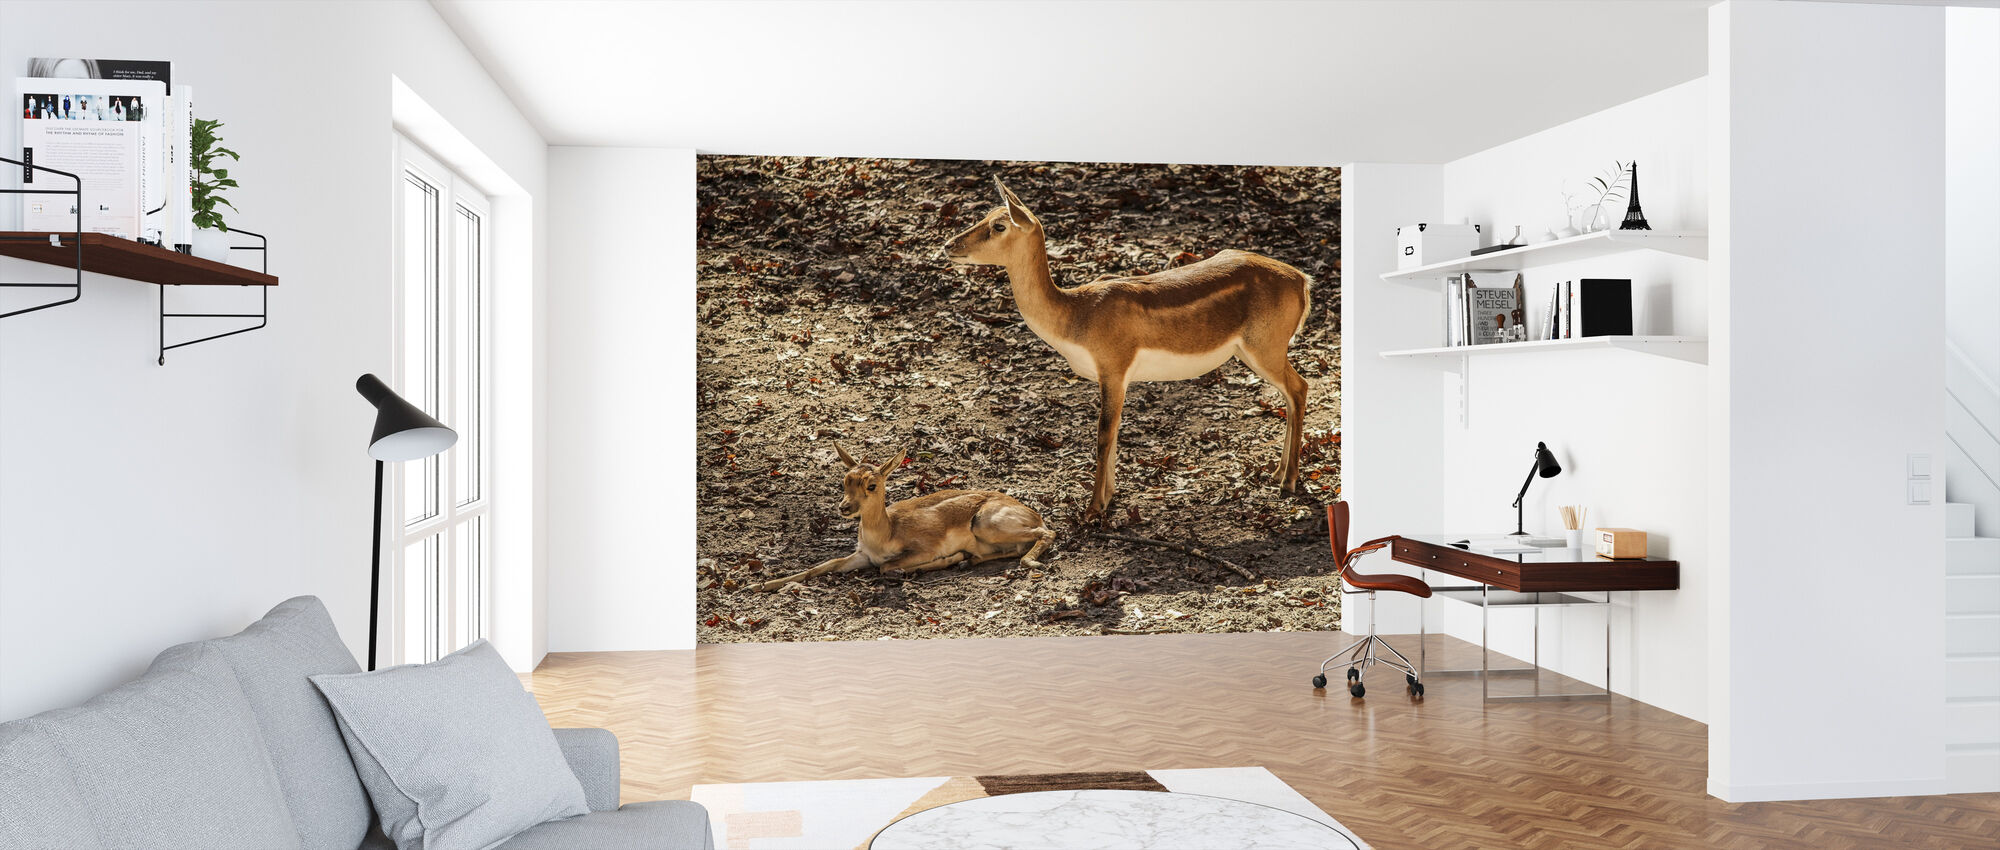 Gazelle Impala - Wallpaper - Office